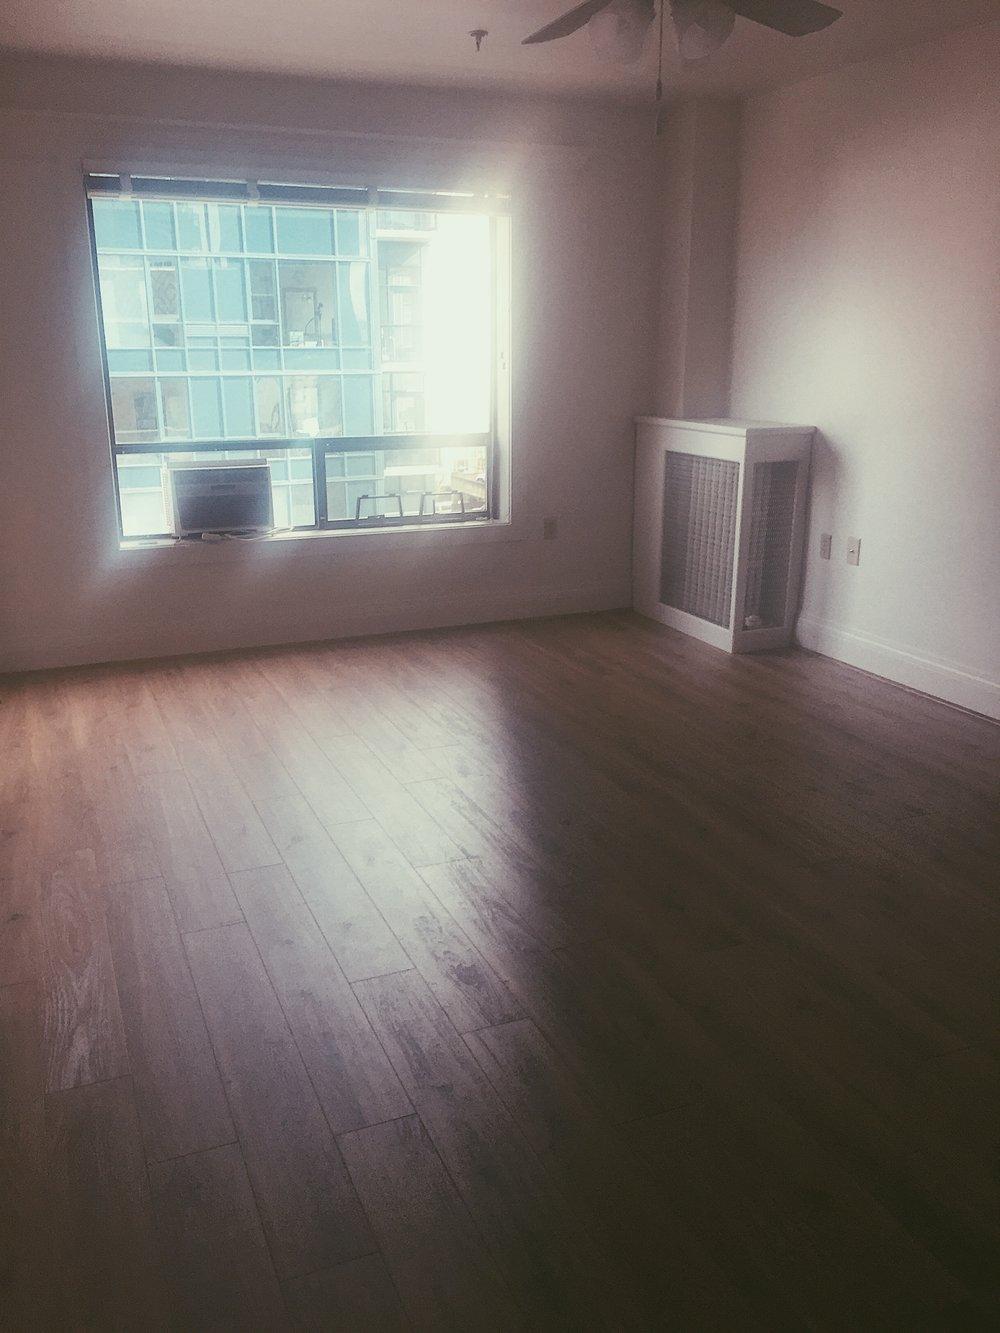 studio-apartment-before.jpg